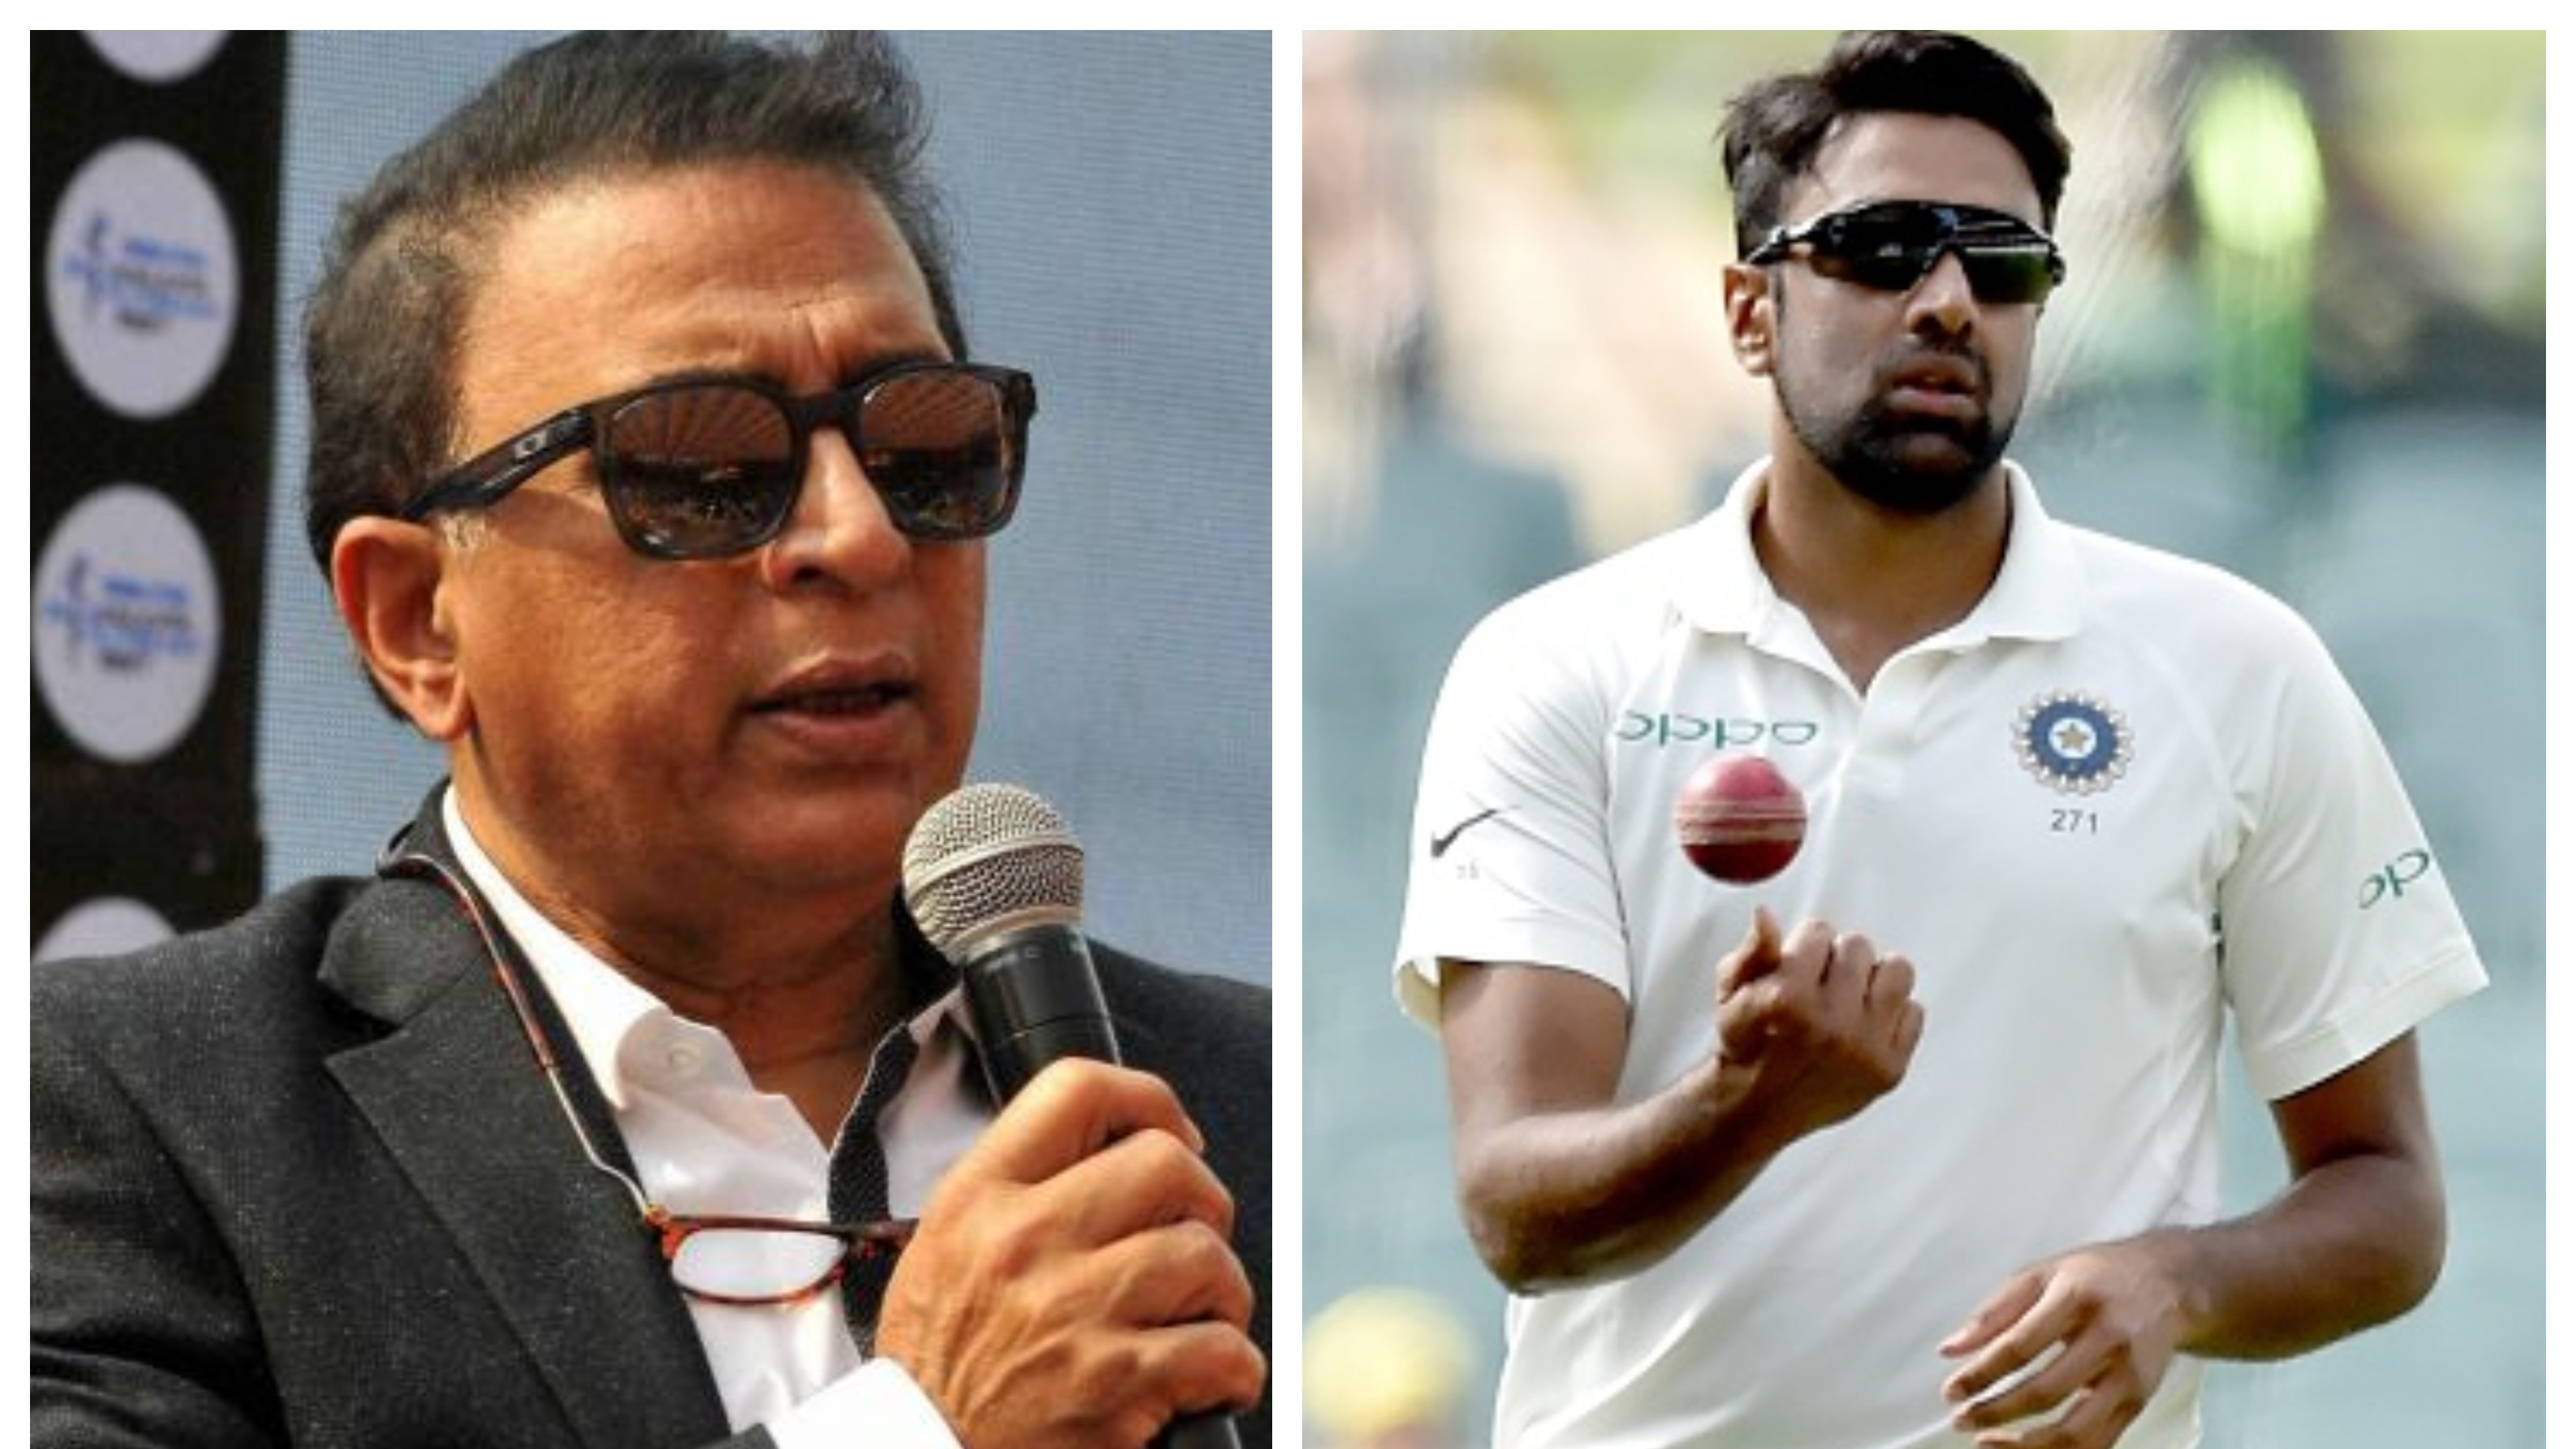 IND v SA 2019: R Ashwin deserves to be a regular starter for India in Tests, reckons Sunil Gavaskar